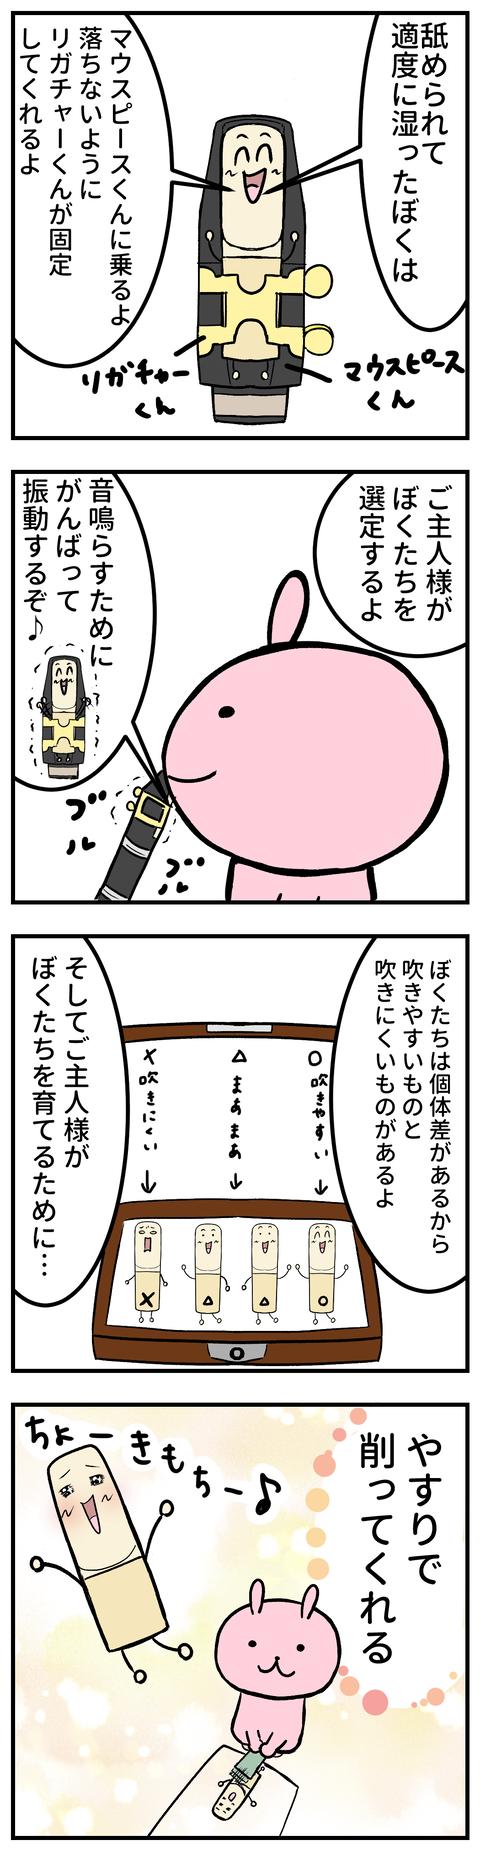 manga-yuzuporo30-1